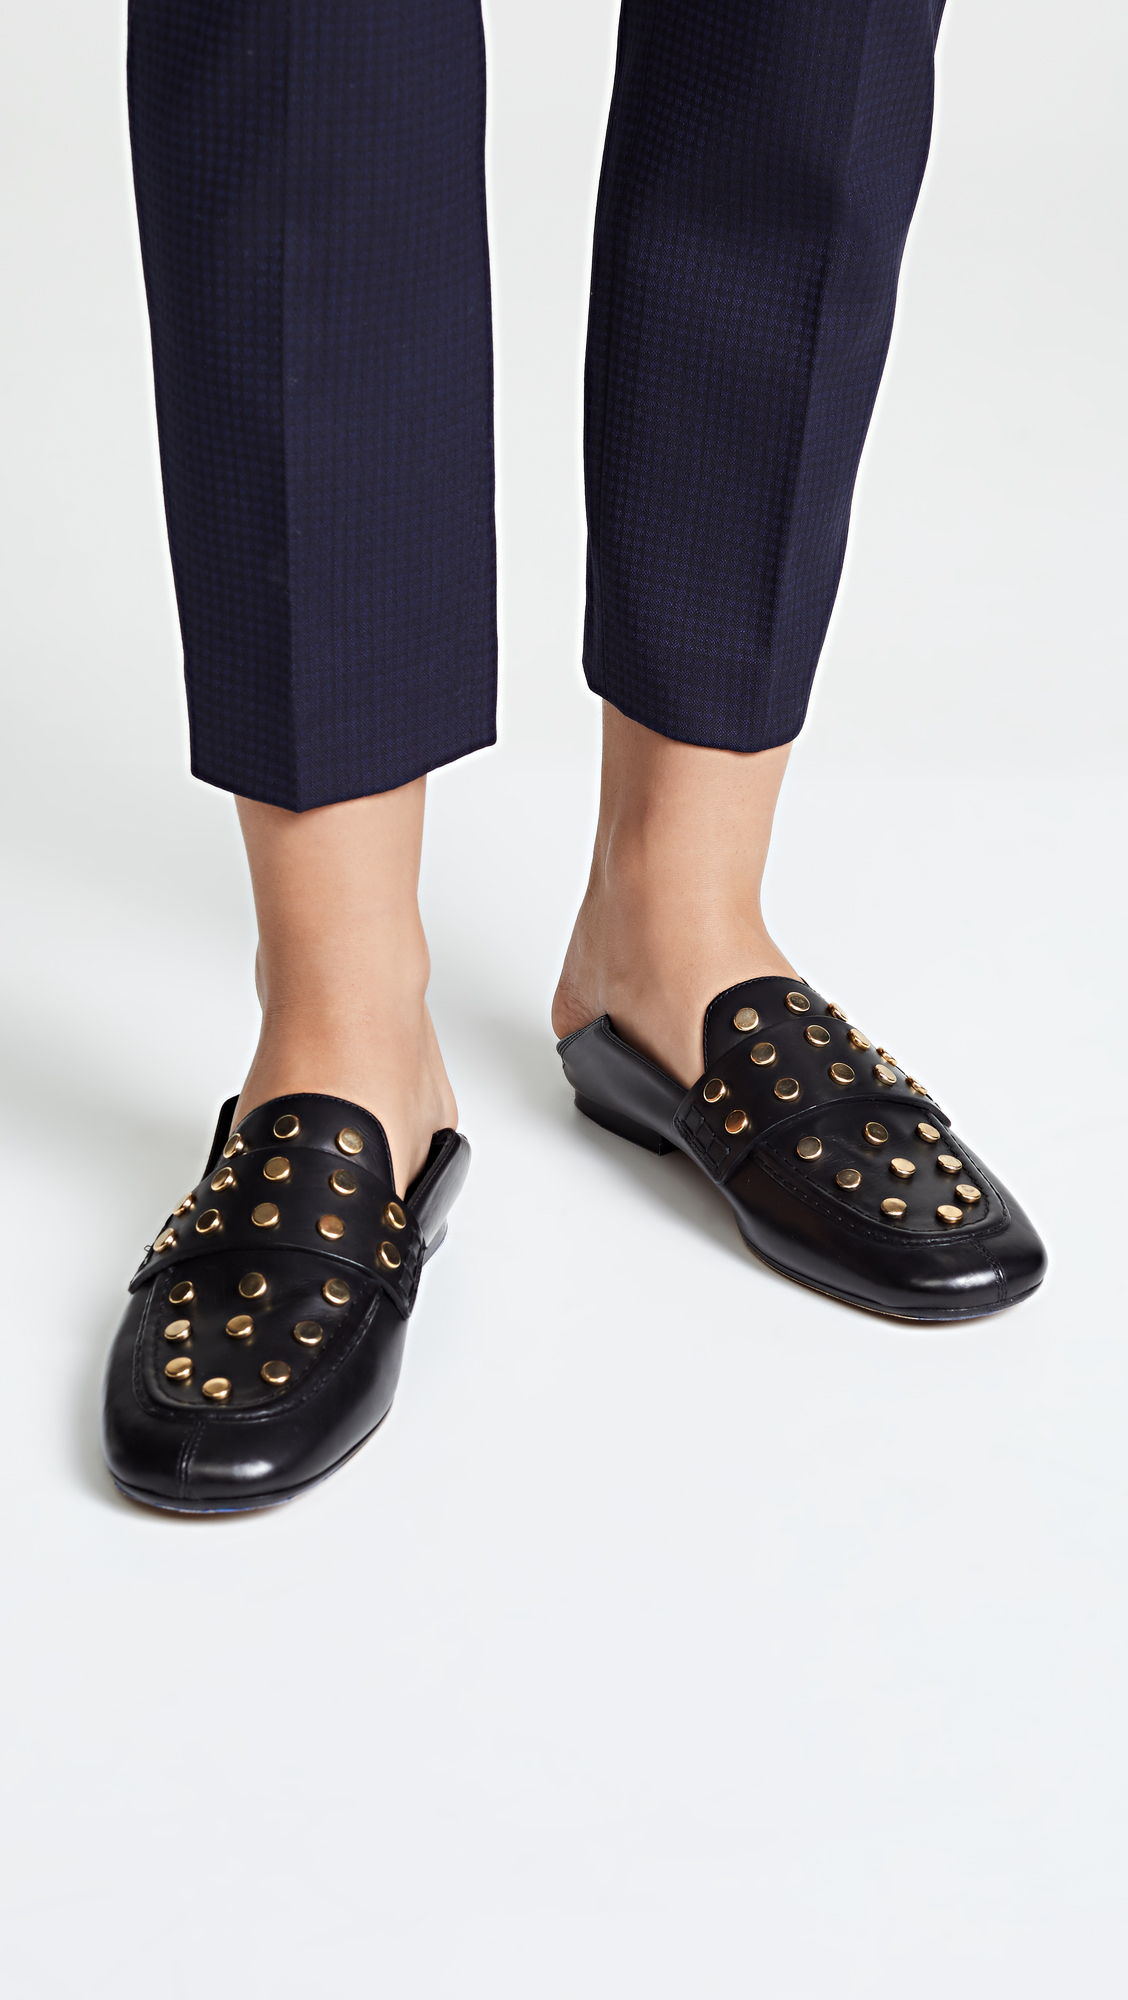 e5df5d3314e Isabel Marant Feenie Convertible Loafers